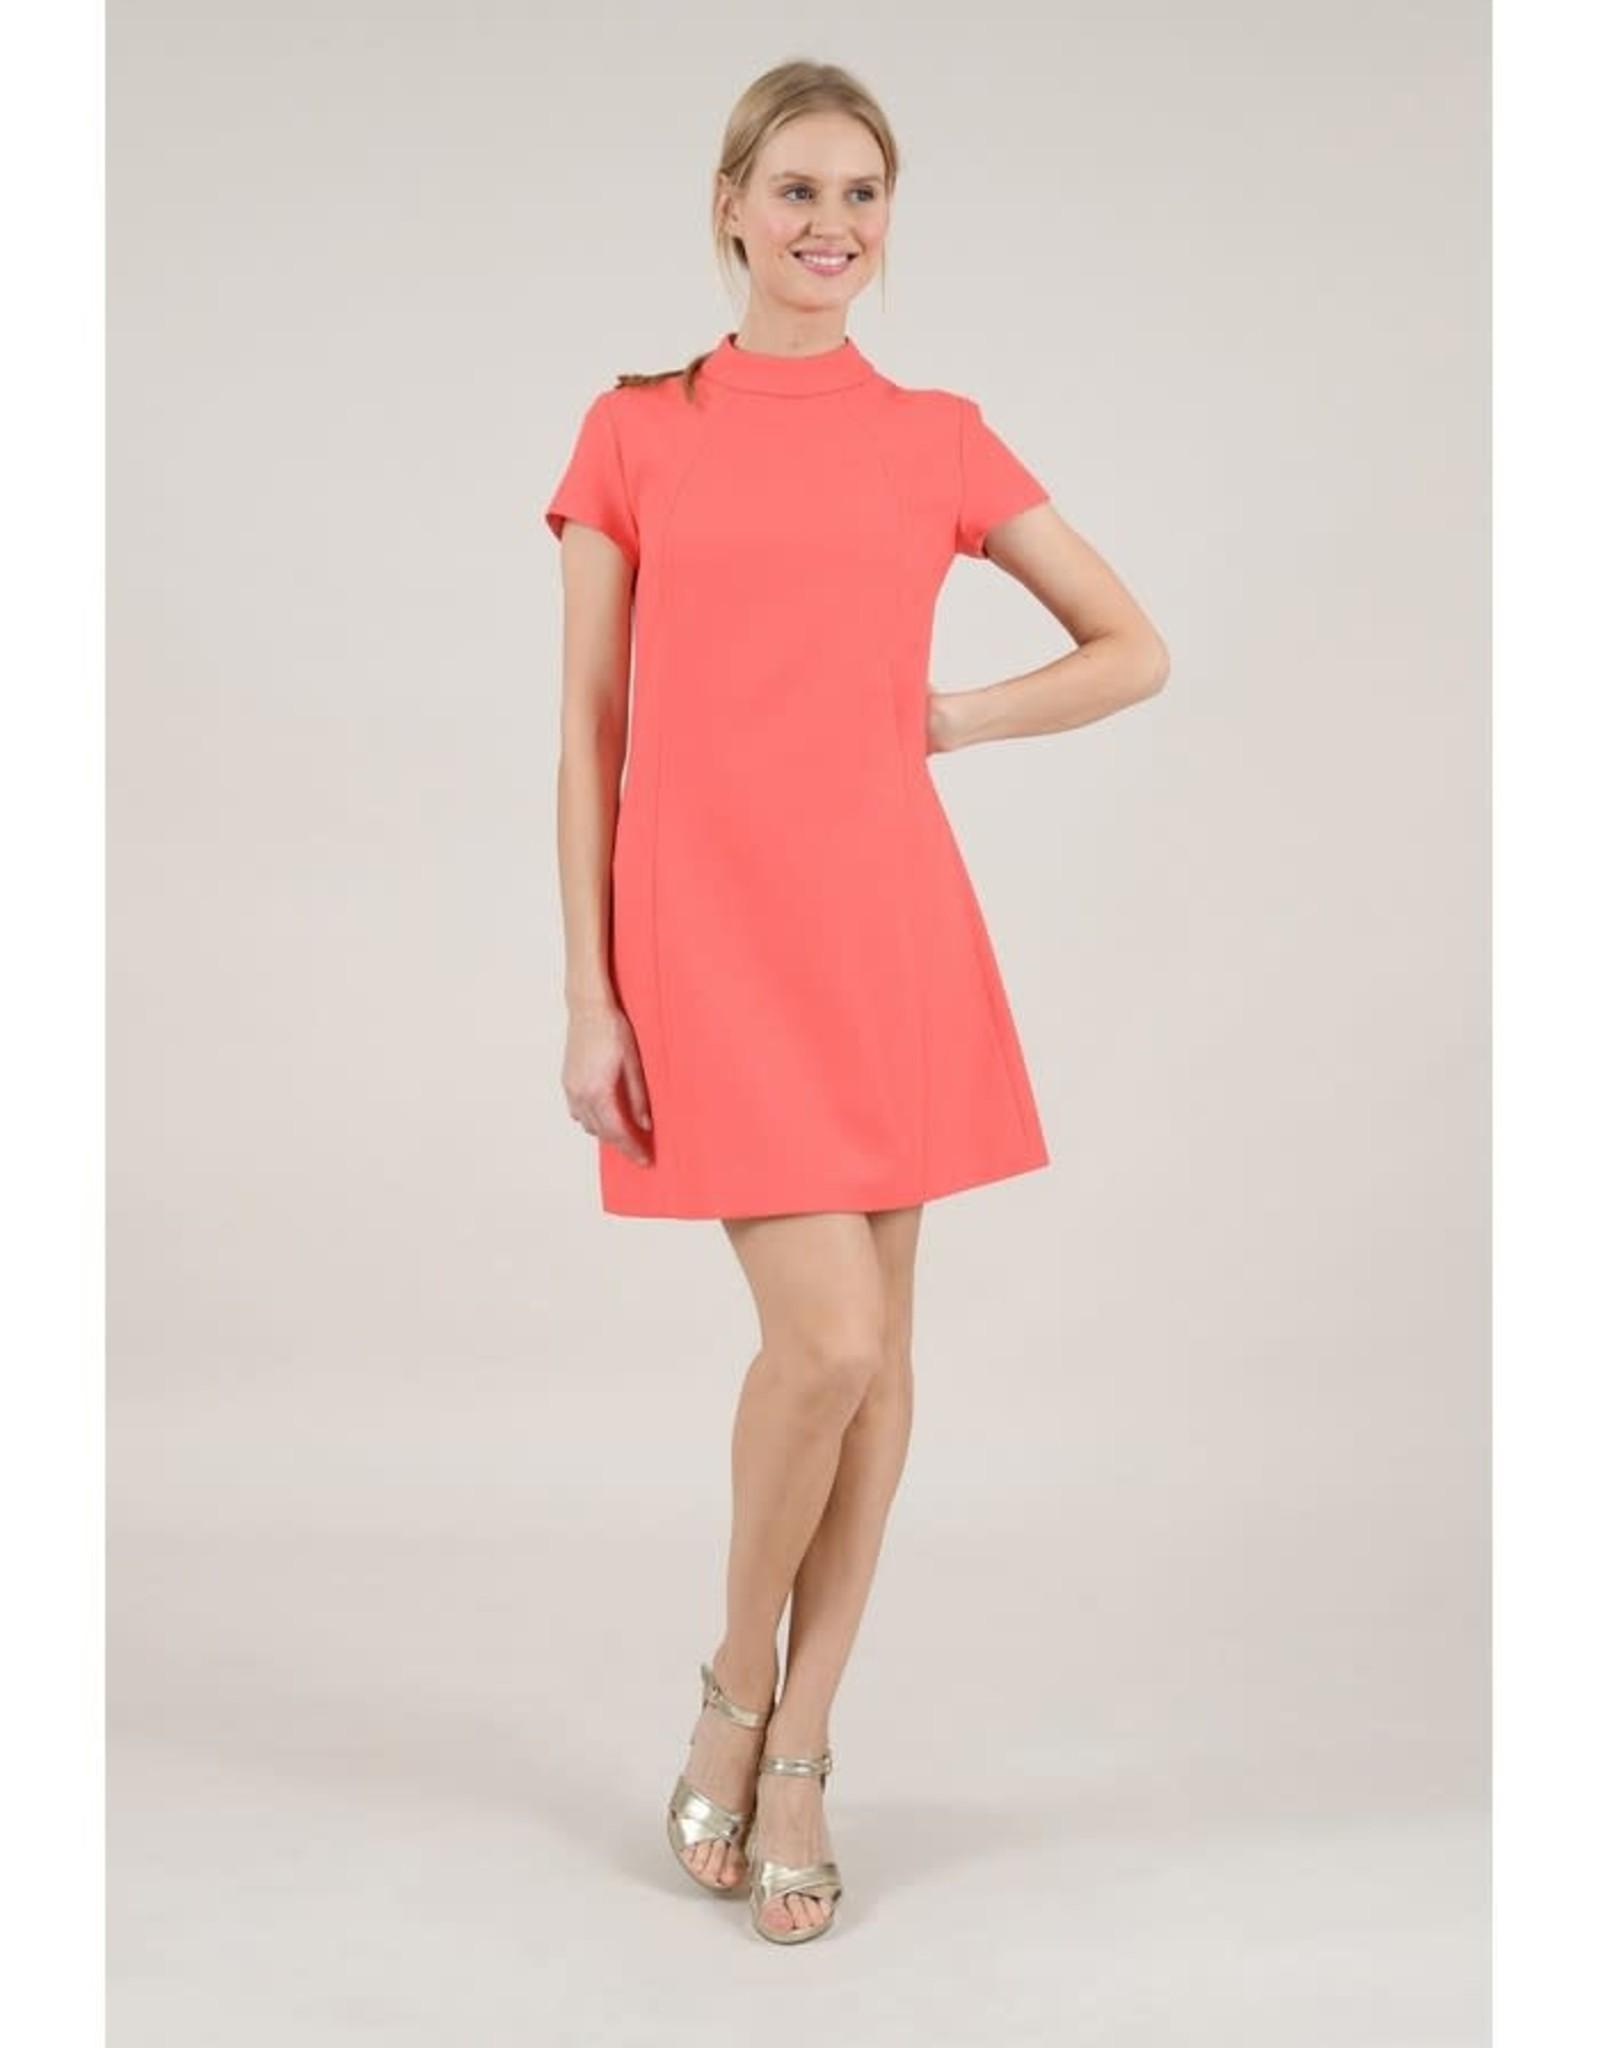 Molly Bracken Coral Mod Shift Dress